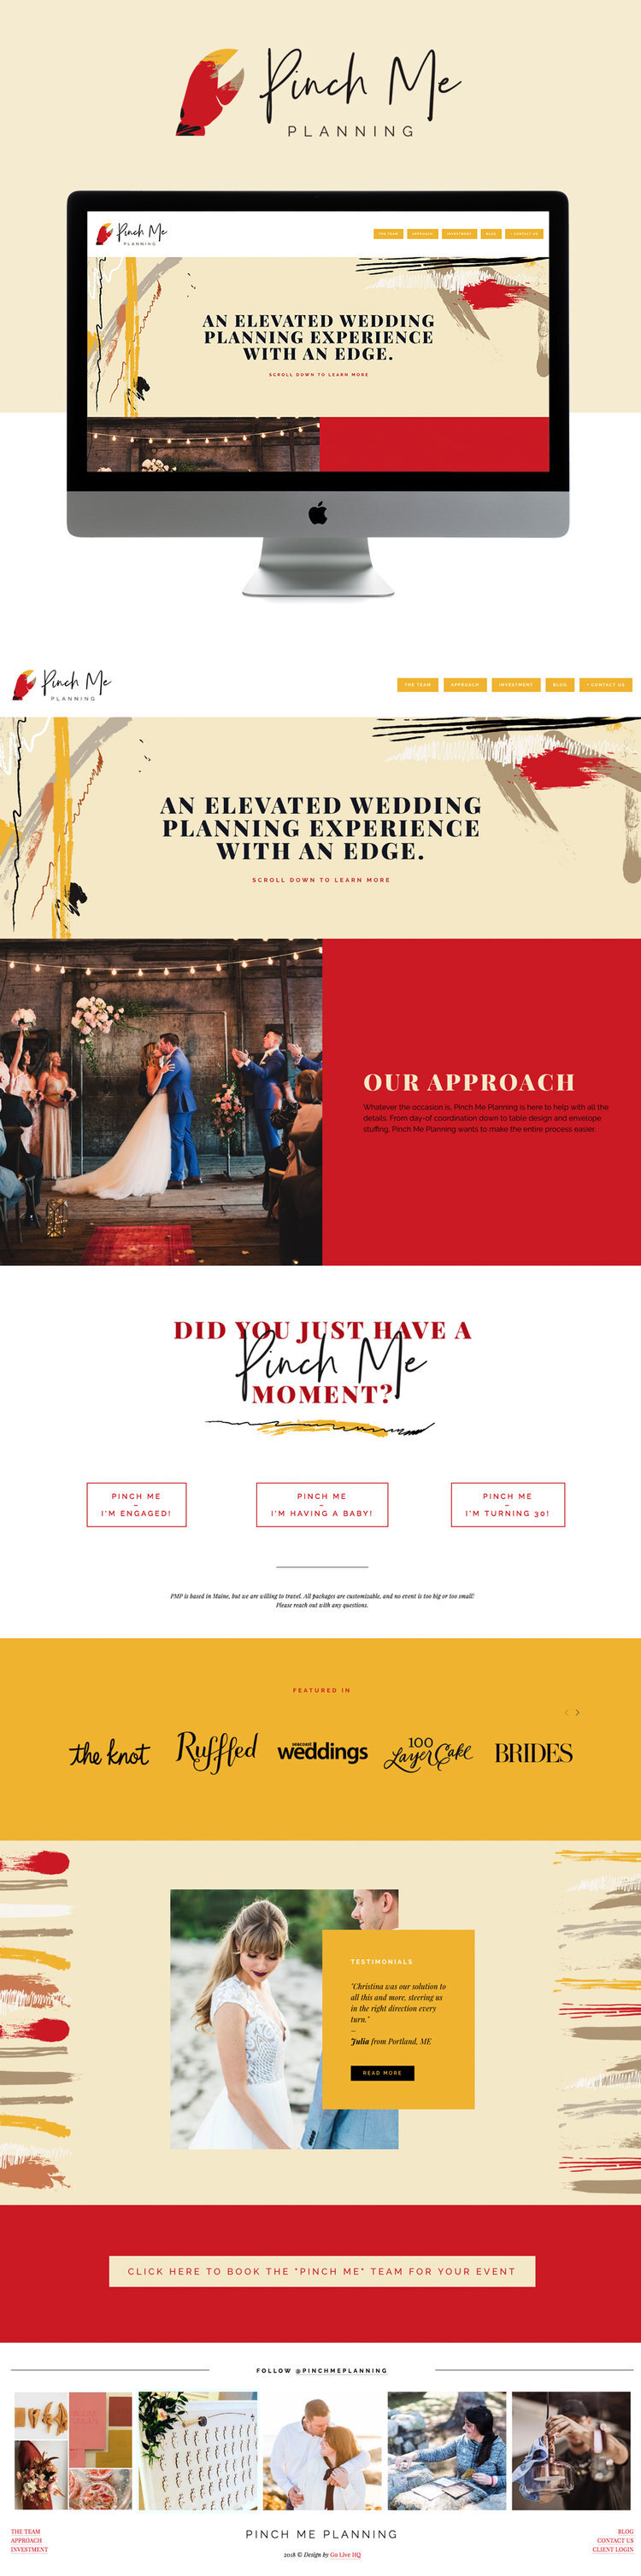 Modern,+Edgy,+Colorful+Website+Design+for+Wedding+Planner+_+Design+by+Go+Live+HQ.jpg